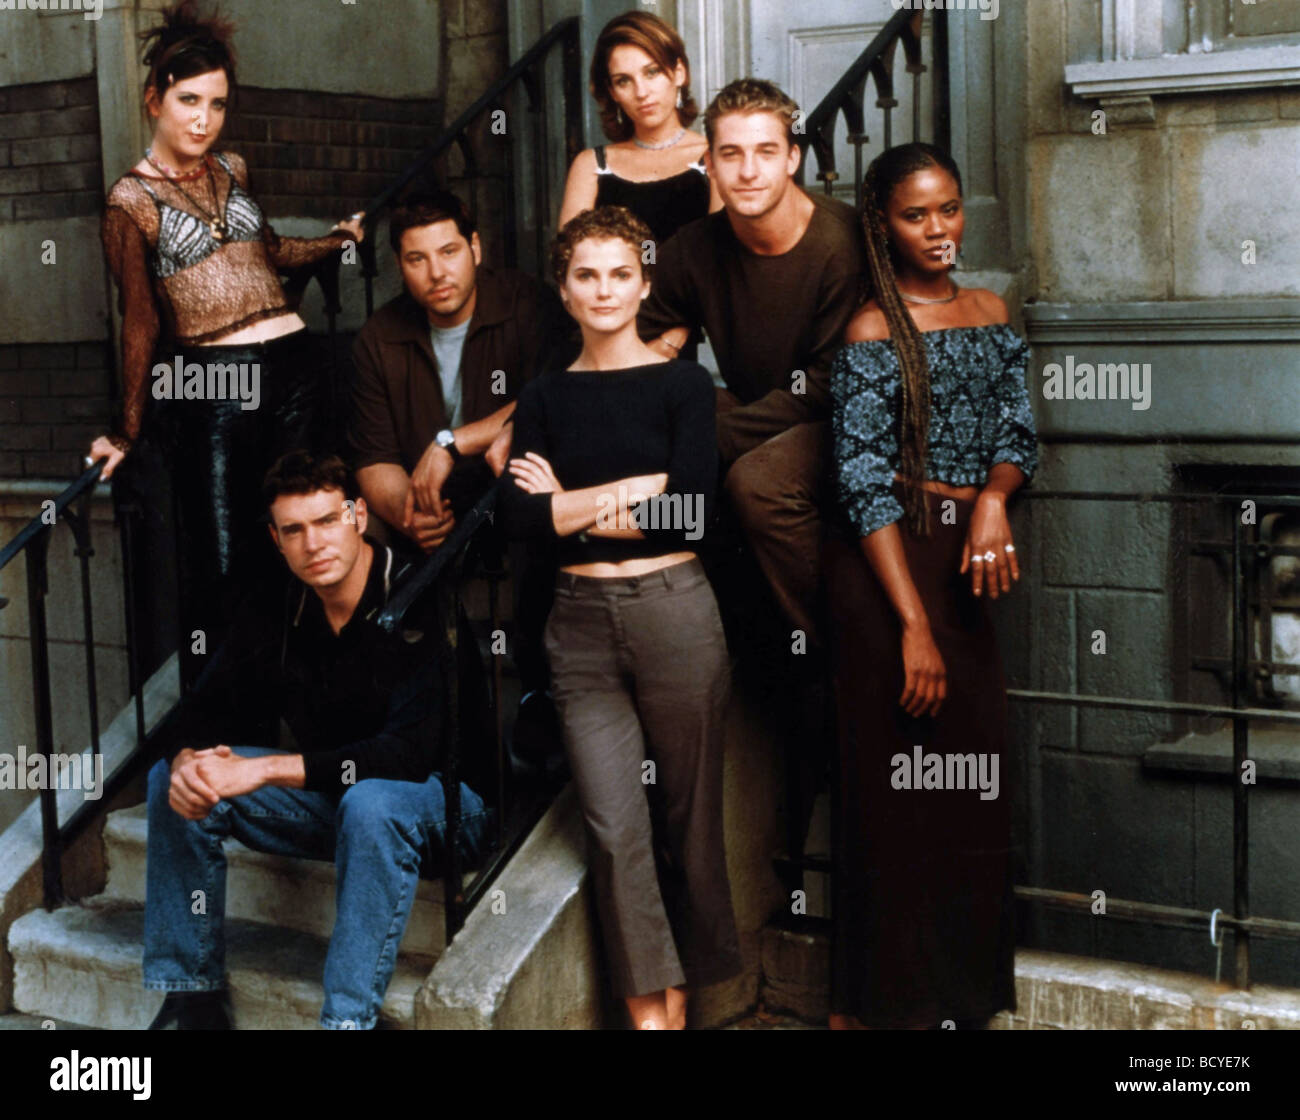 Felicity (TV series ) Year  1998 - 2002 Creator  J.J. Abrams Amanda Foreman, Scott Foley, Greg Grunberg, Keri Russel, - Stock Image